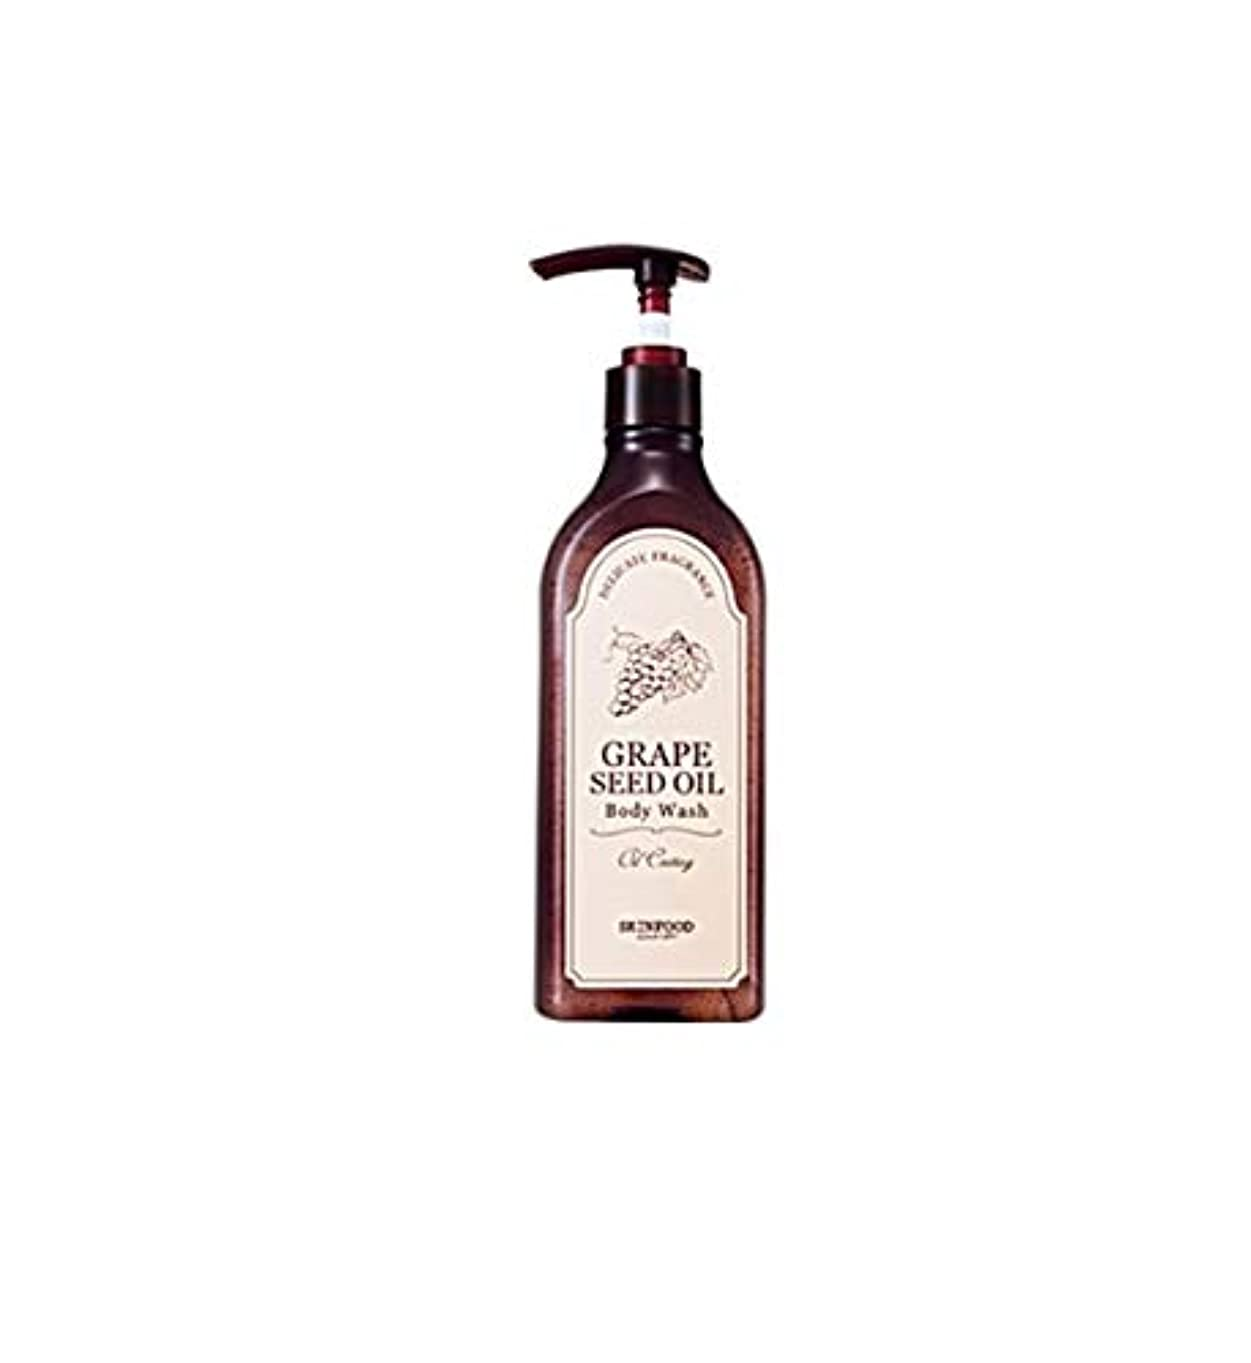 Skinfood グレープシードオイルボディウォッシュ/Grape Seed Oil Body Wash 335ml [並行輸入品]